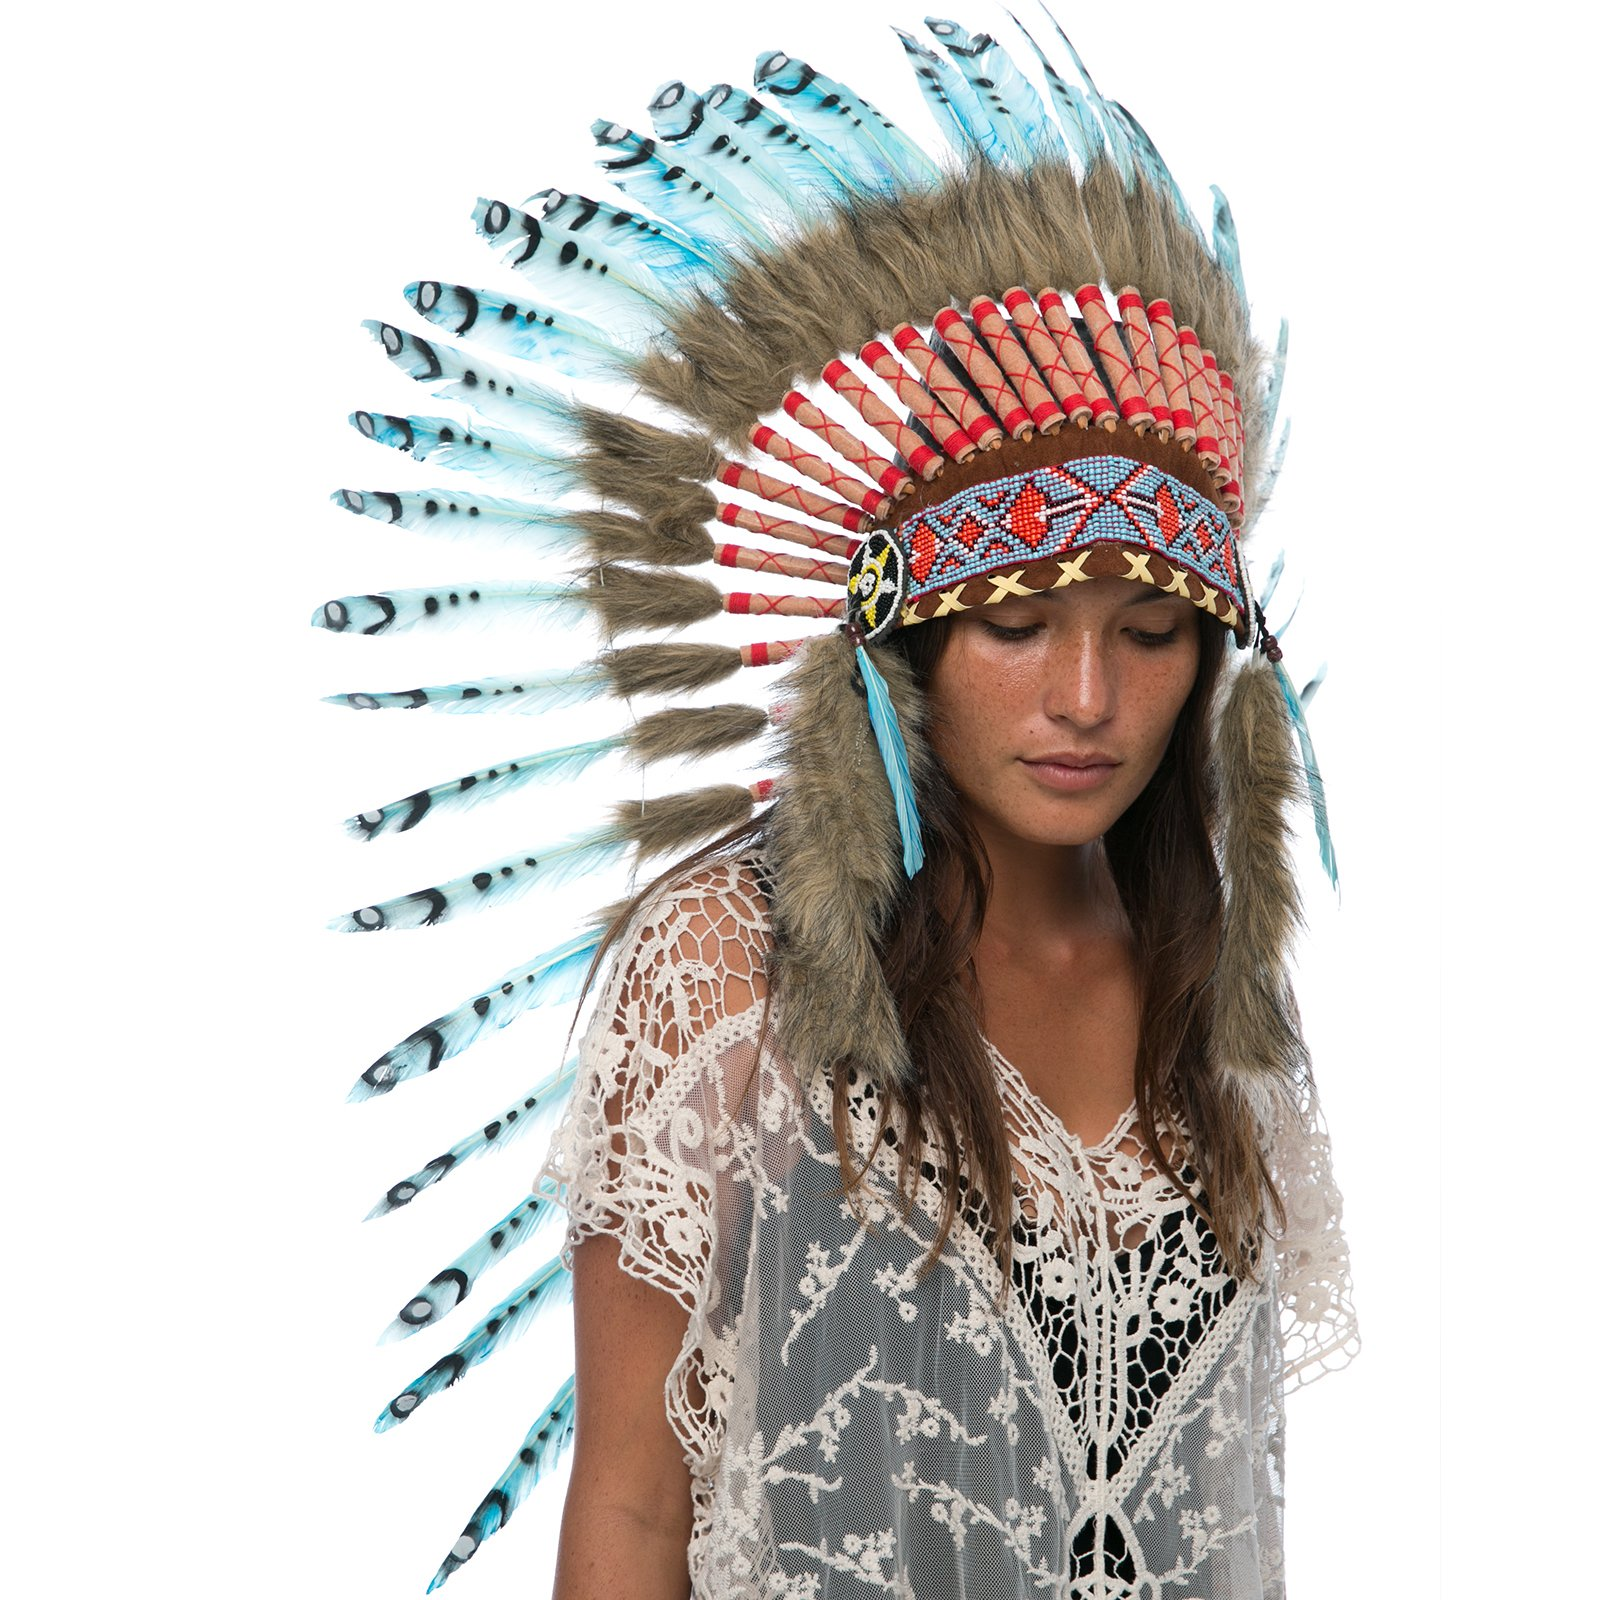 Talented message American indian women seeking men curious